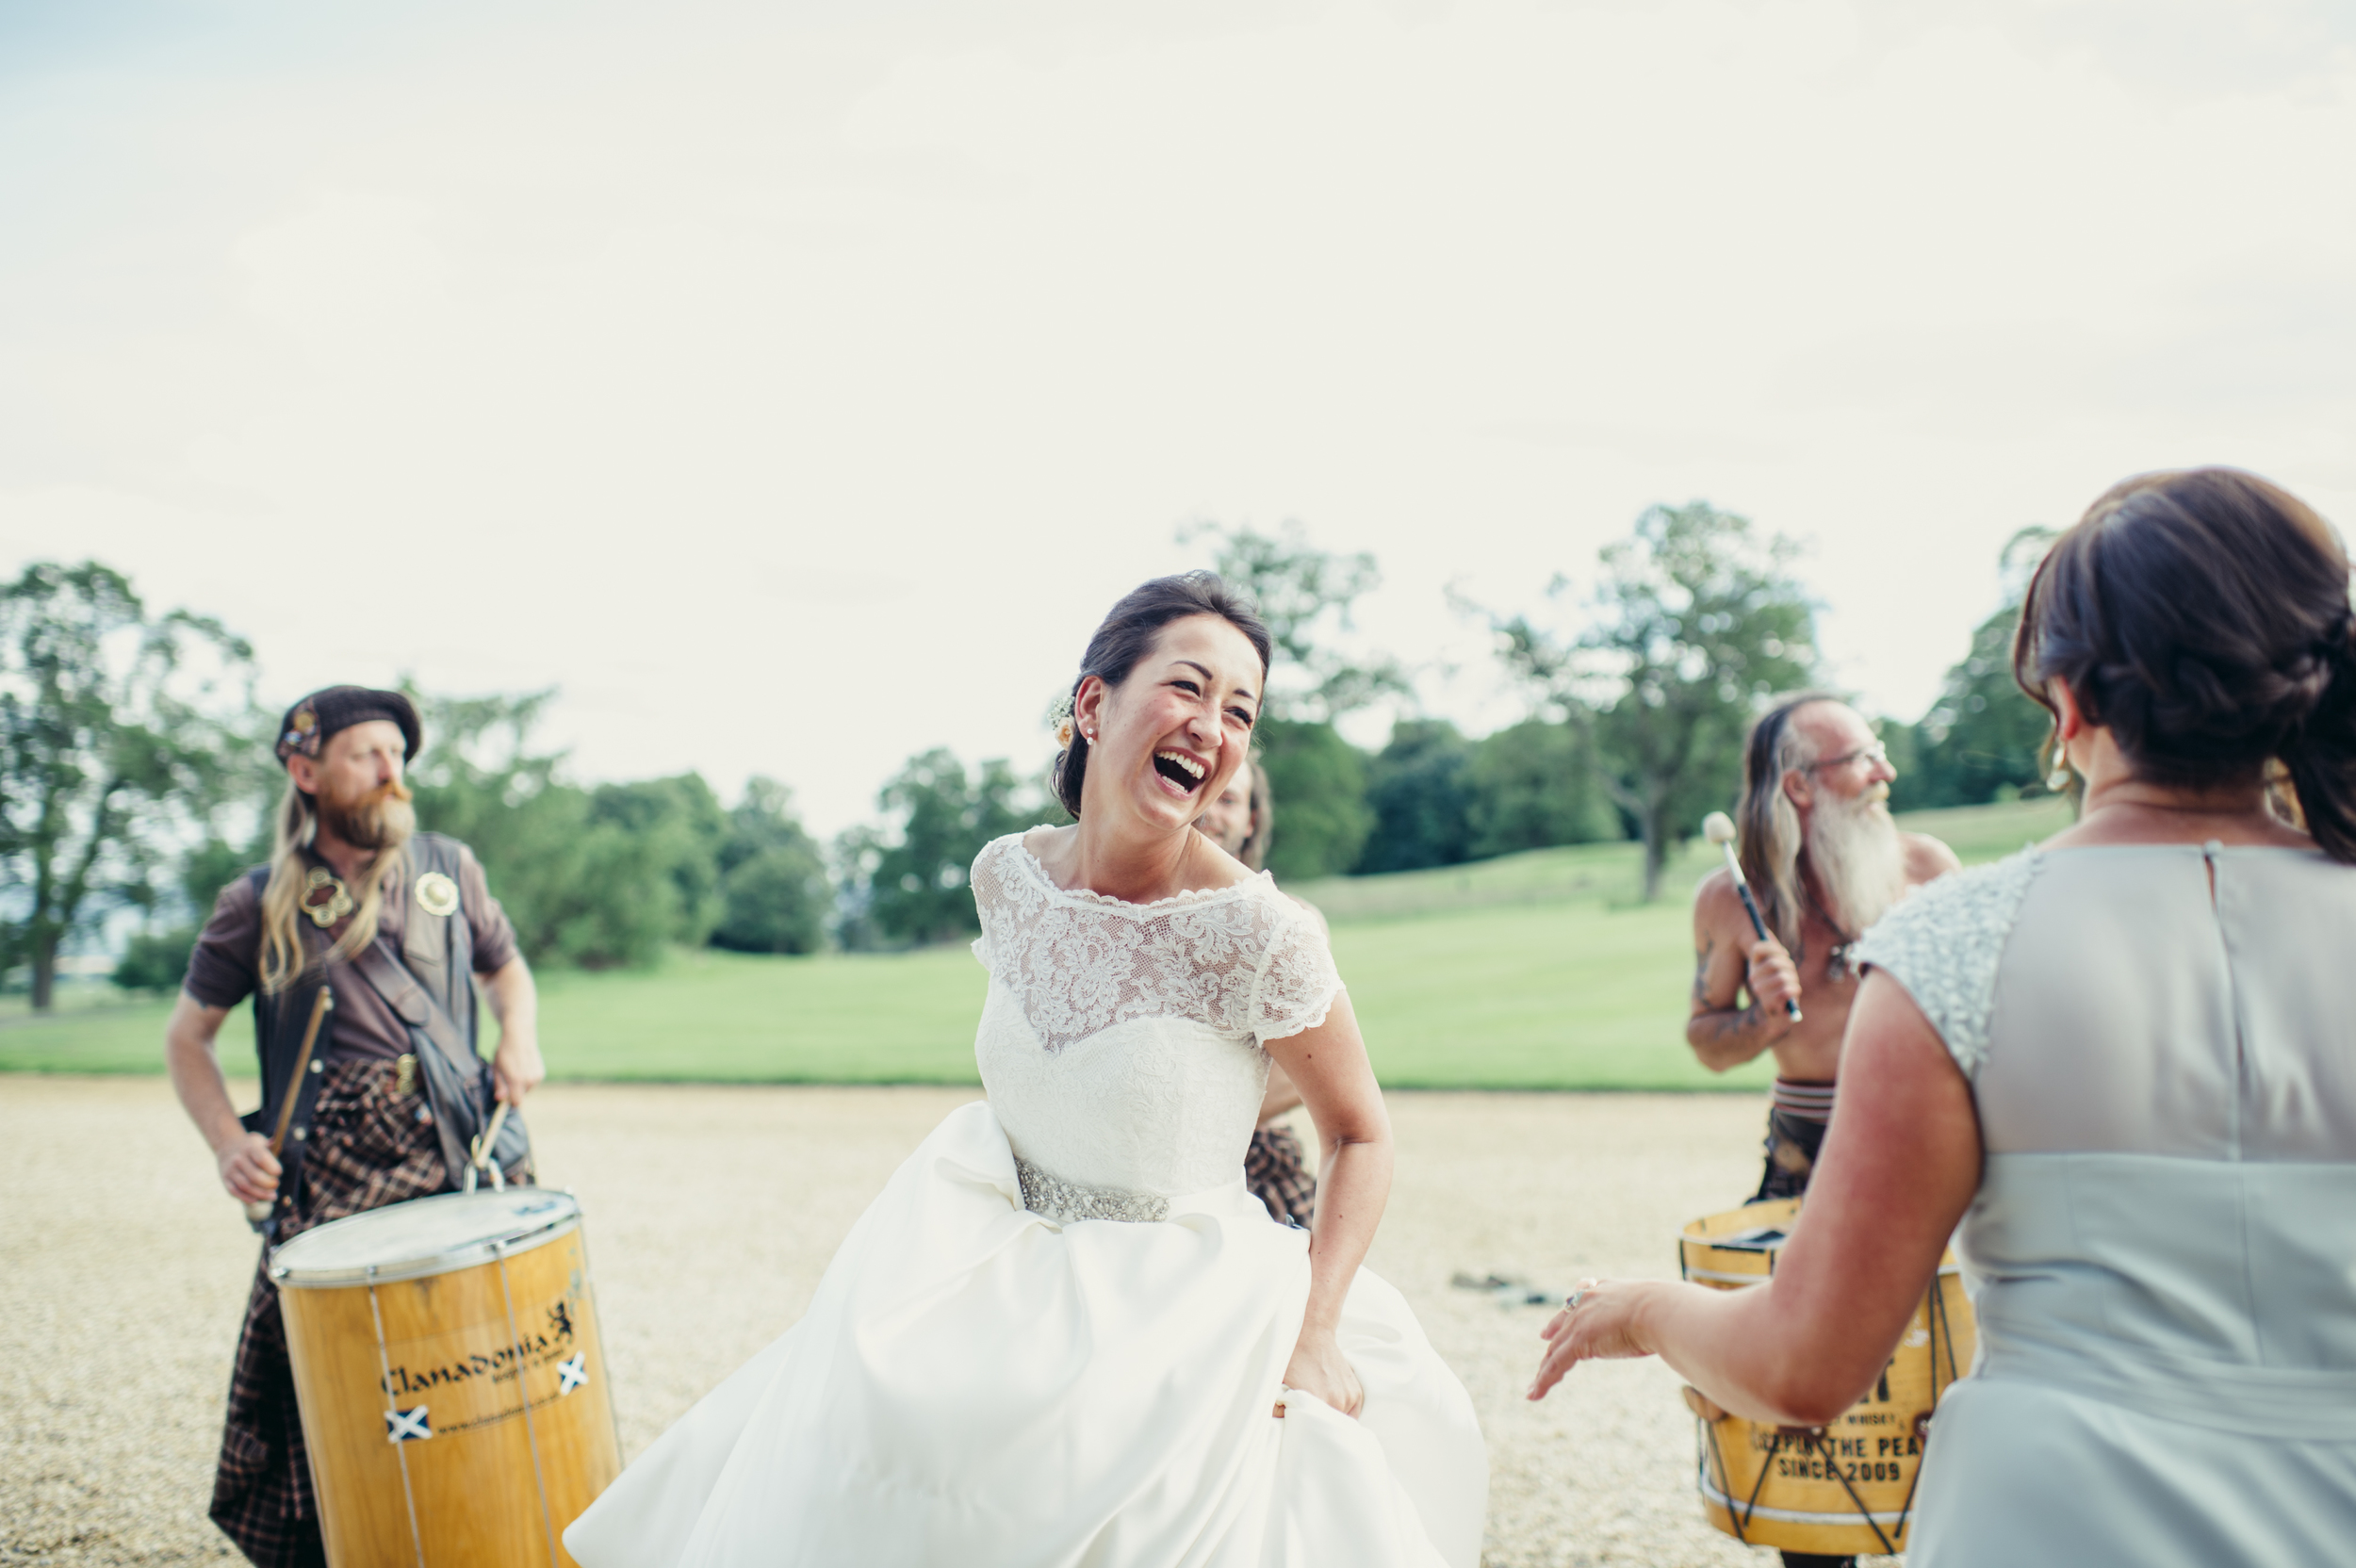 0141-lisa-devine-alternative-creative-wedding-photography-glasgow-edinburgh.JPG